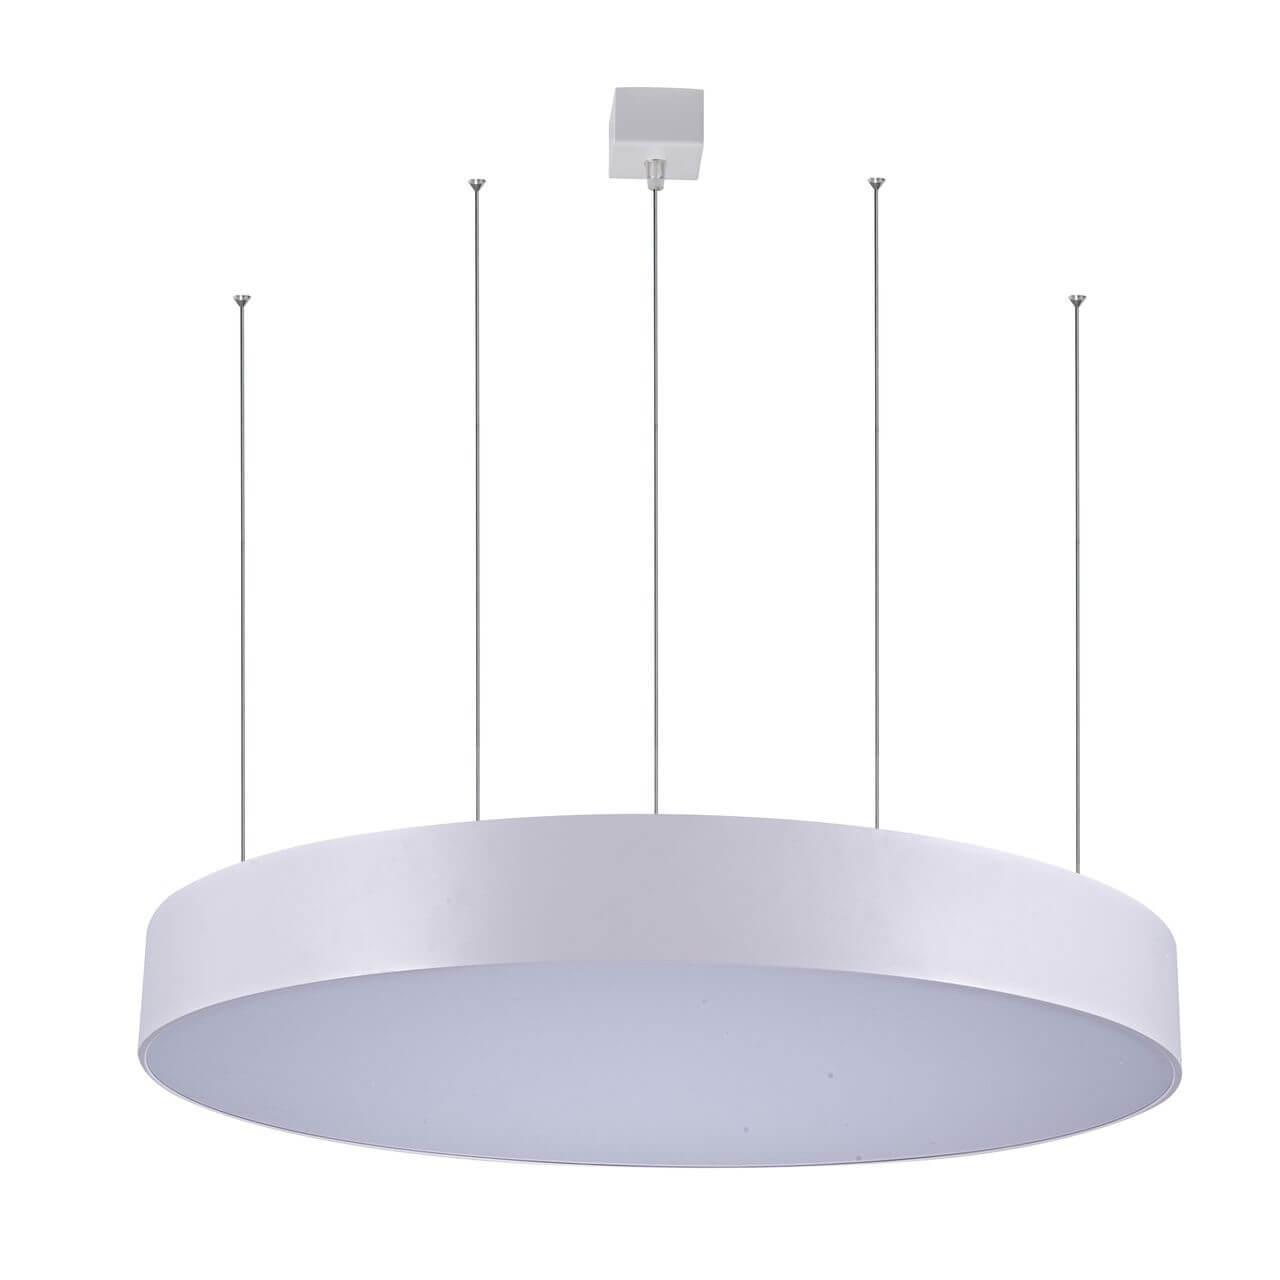 Подвесной светильник Divinare 8021/96 SP-1, LED, 152 Вт цена